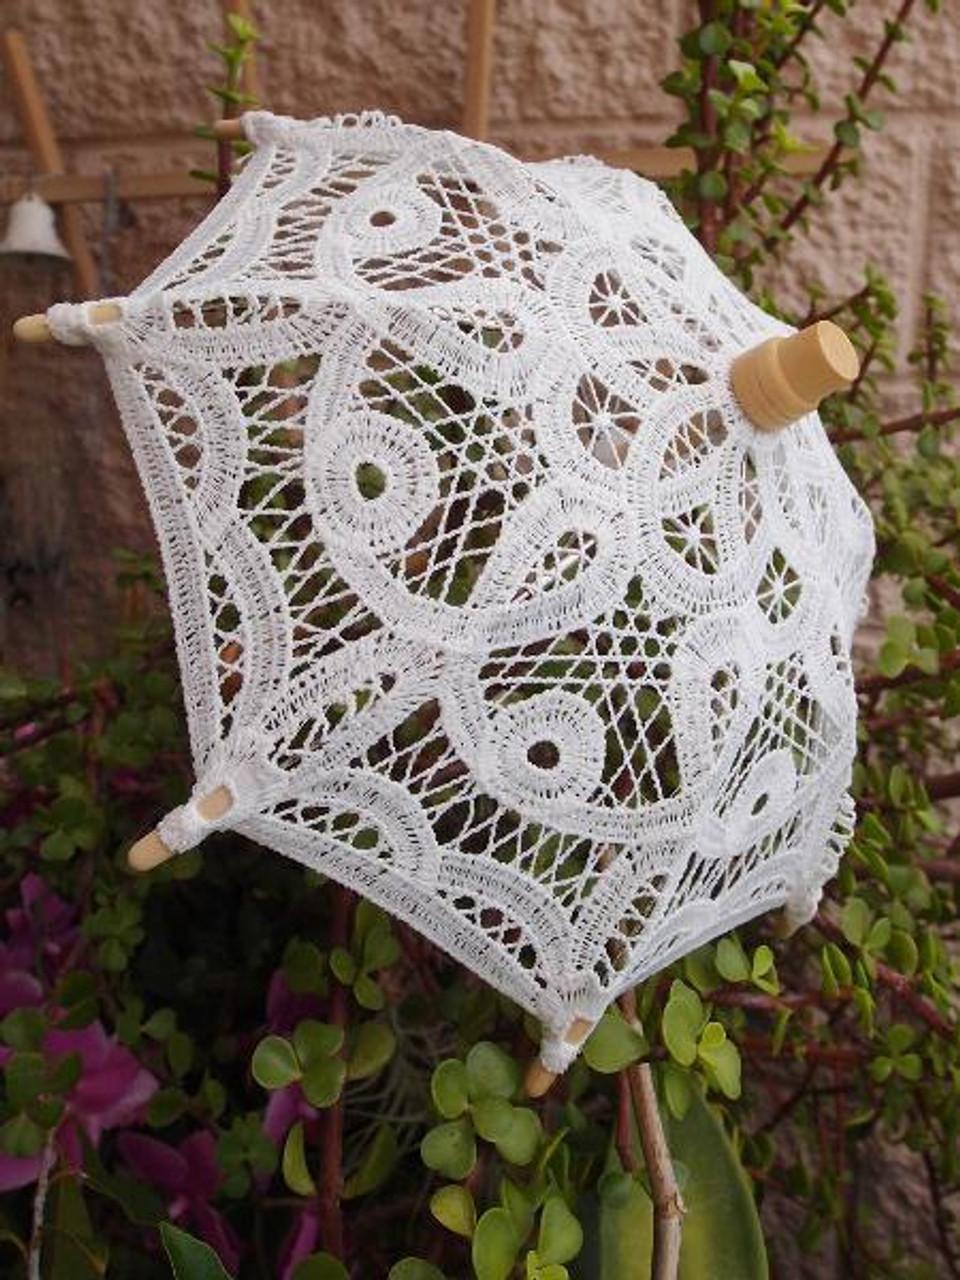 Battenburg Lace Parasol for Weddings and Events, Lace Parasols | Packaging Decor